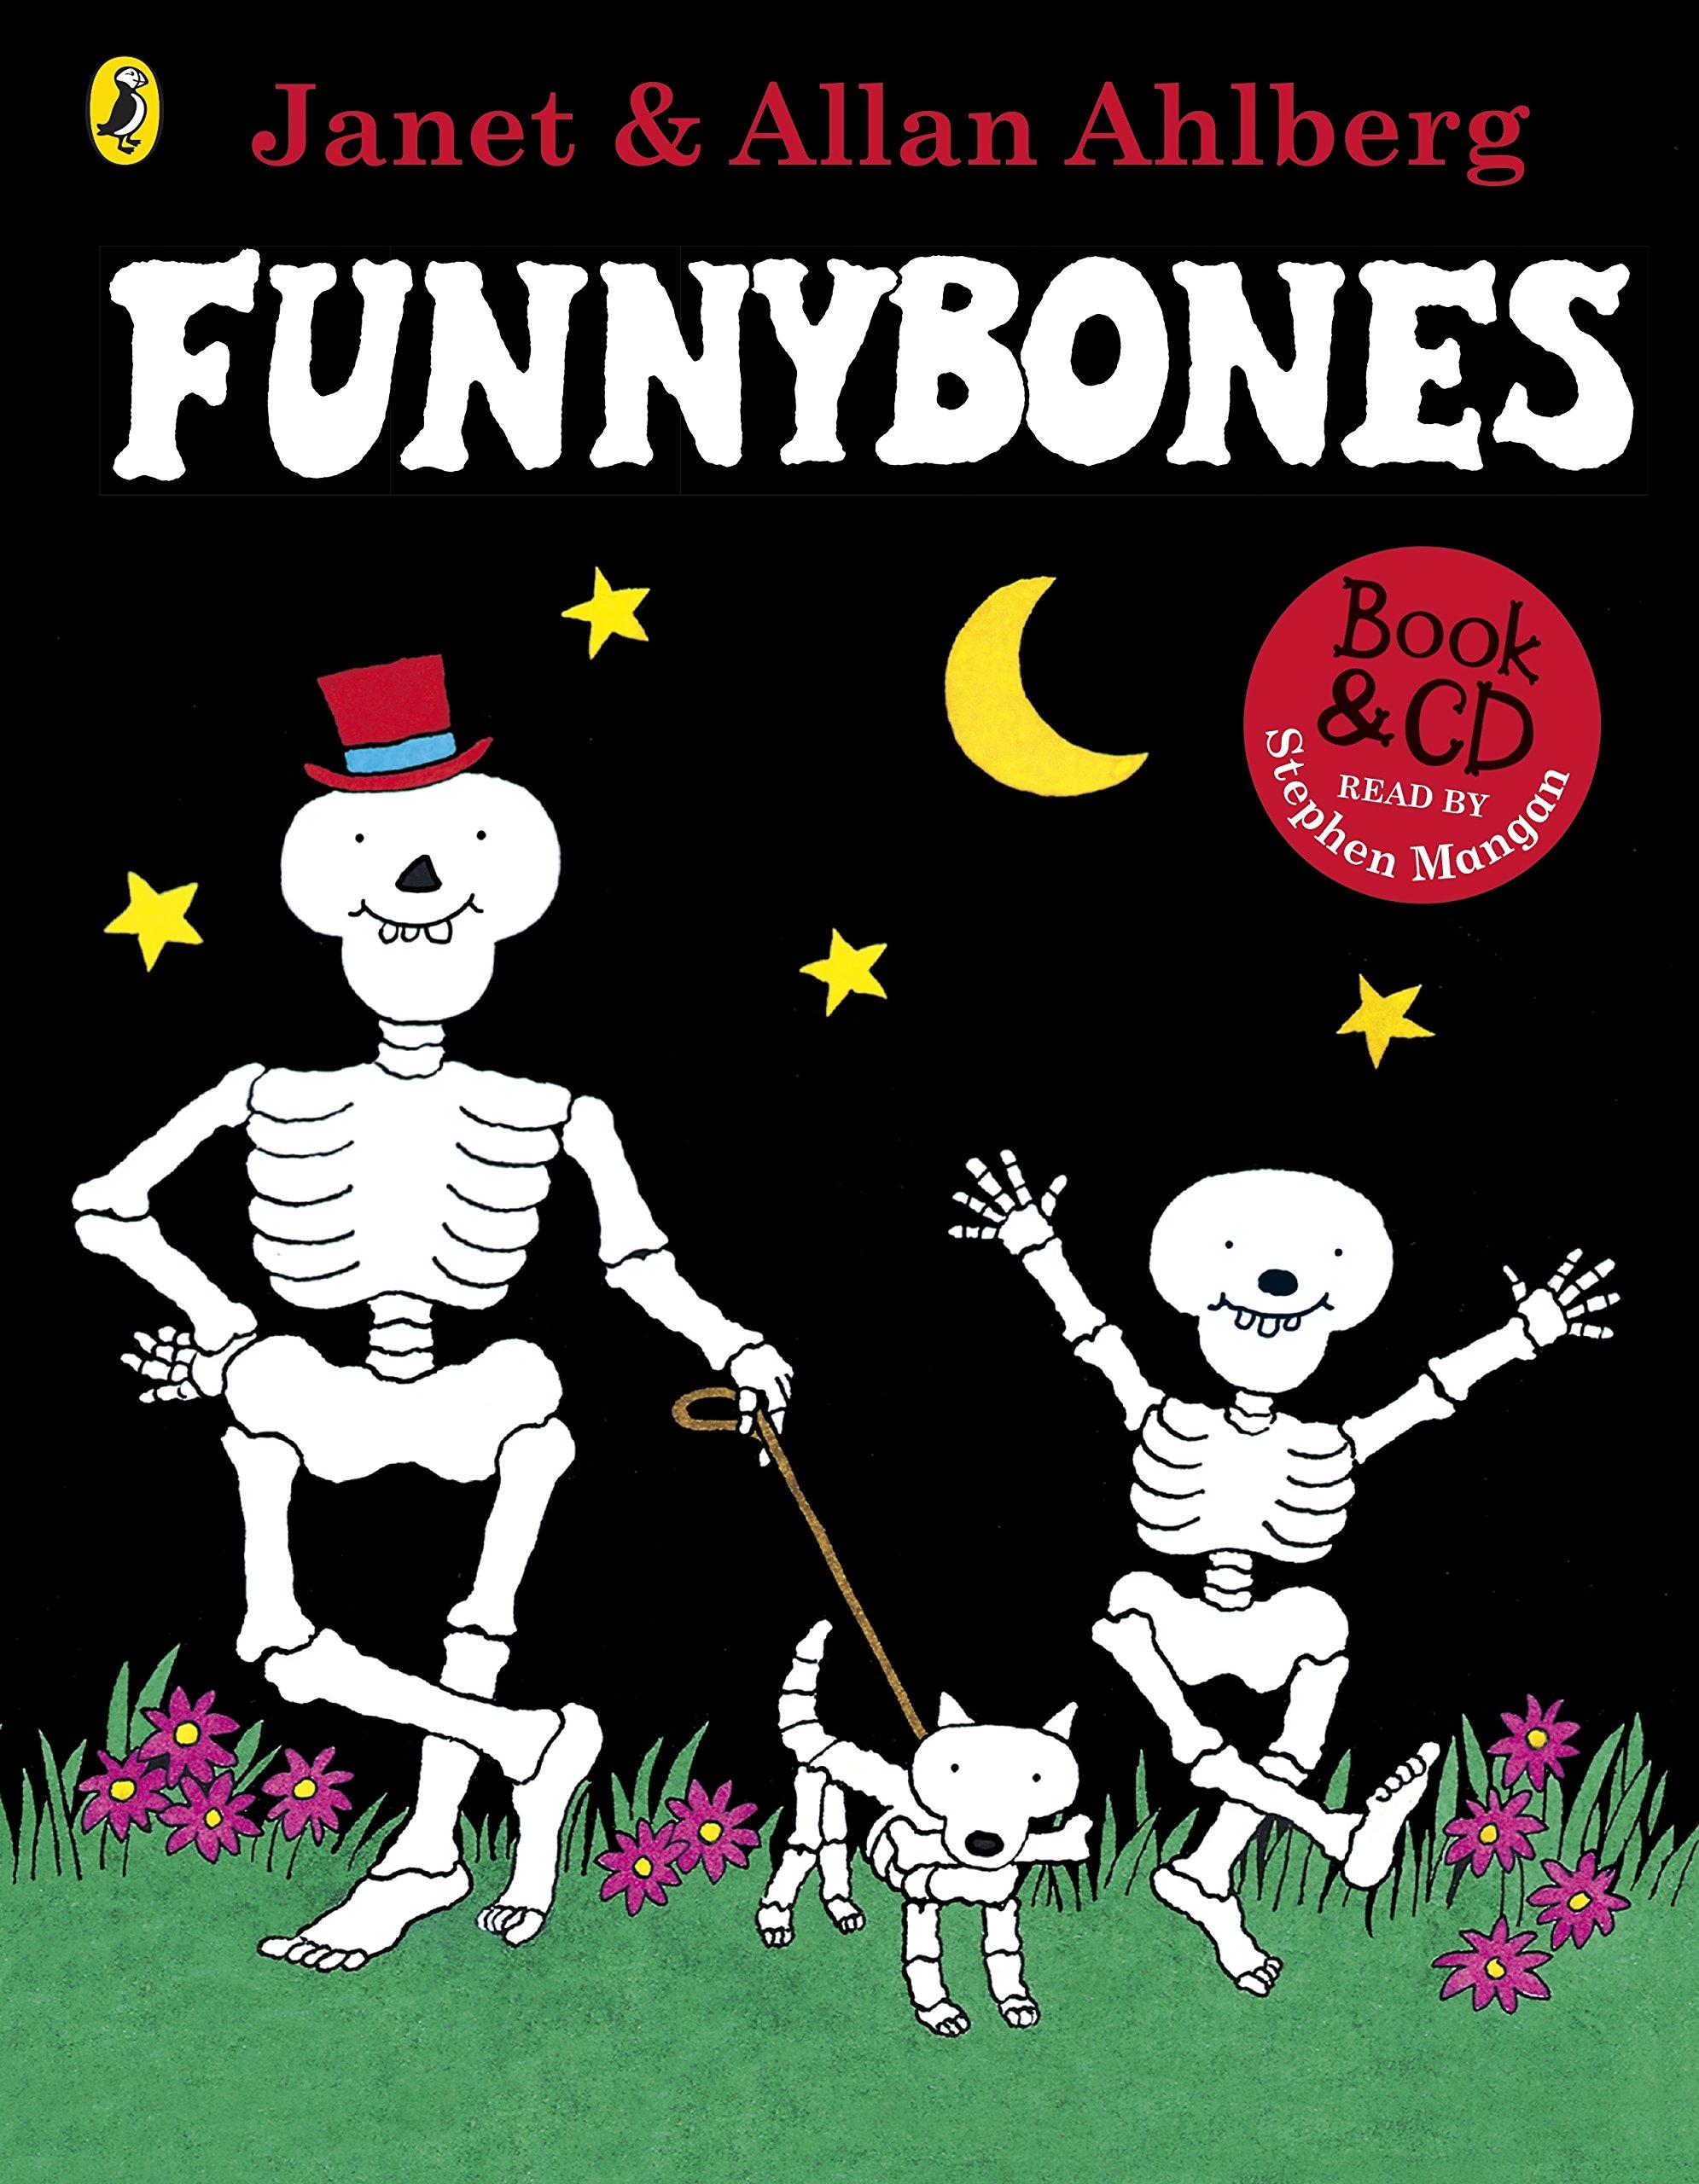 Funnybones: Book & CD : Ahlberg, Allan, Ahlberg, Janet, Ahlberg, Janet:  Amazon.co.uk: Books